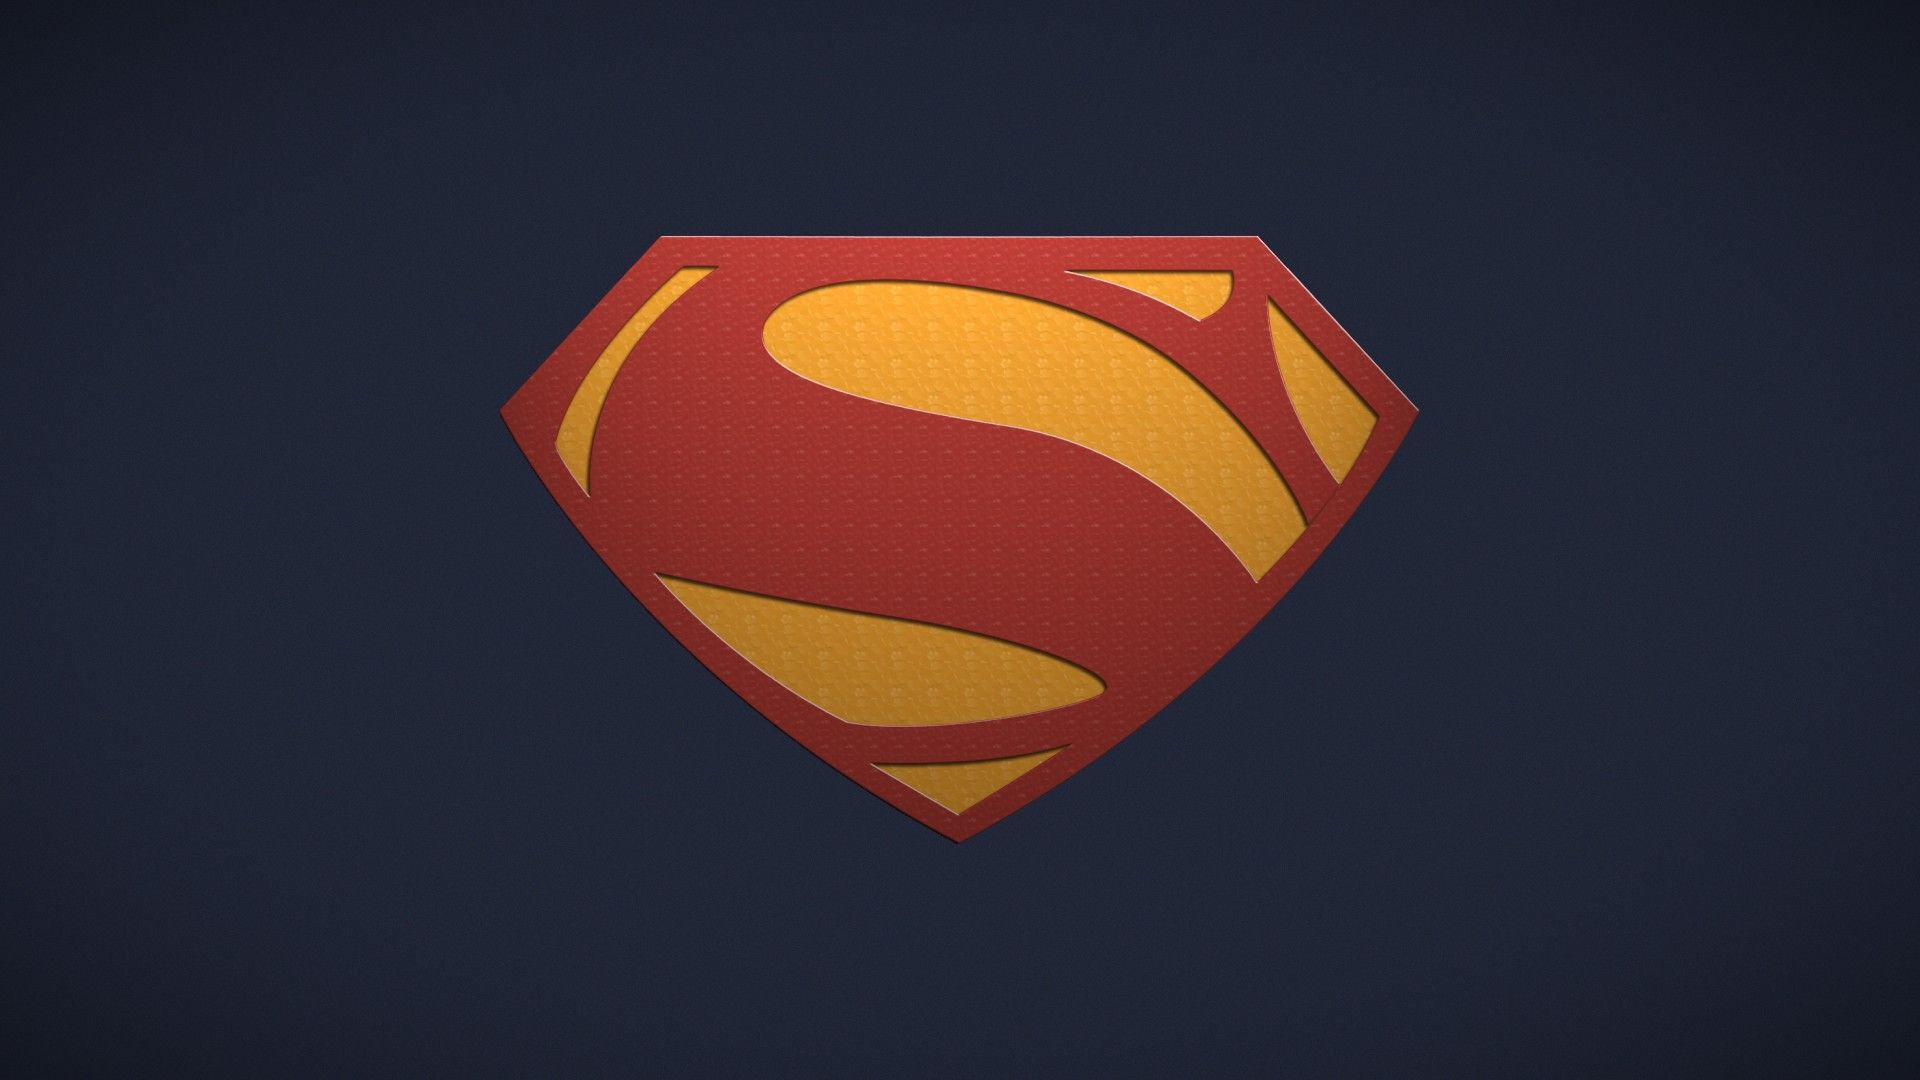 superhero logo wallpapers Google Search Ipad picture